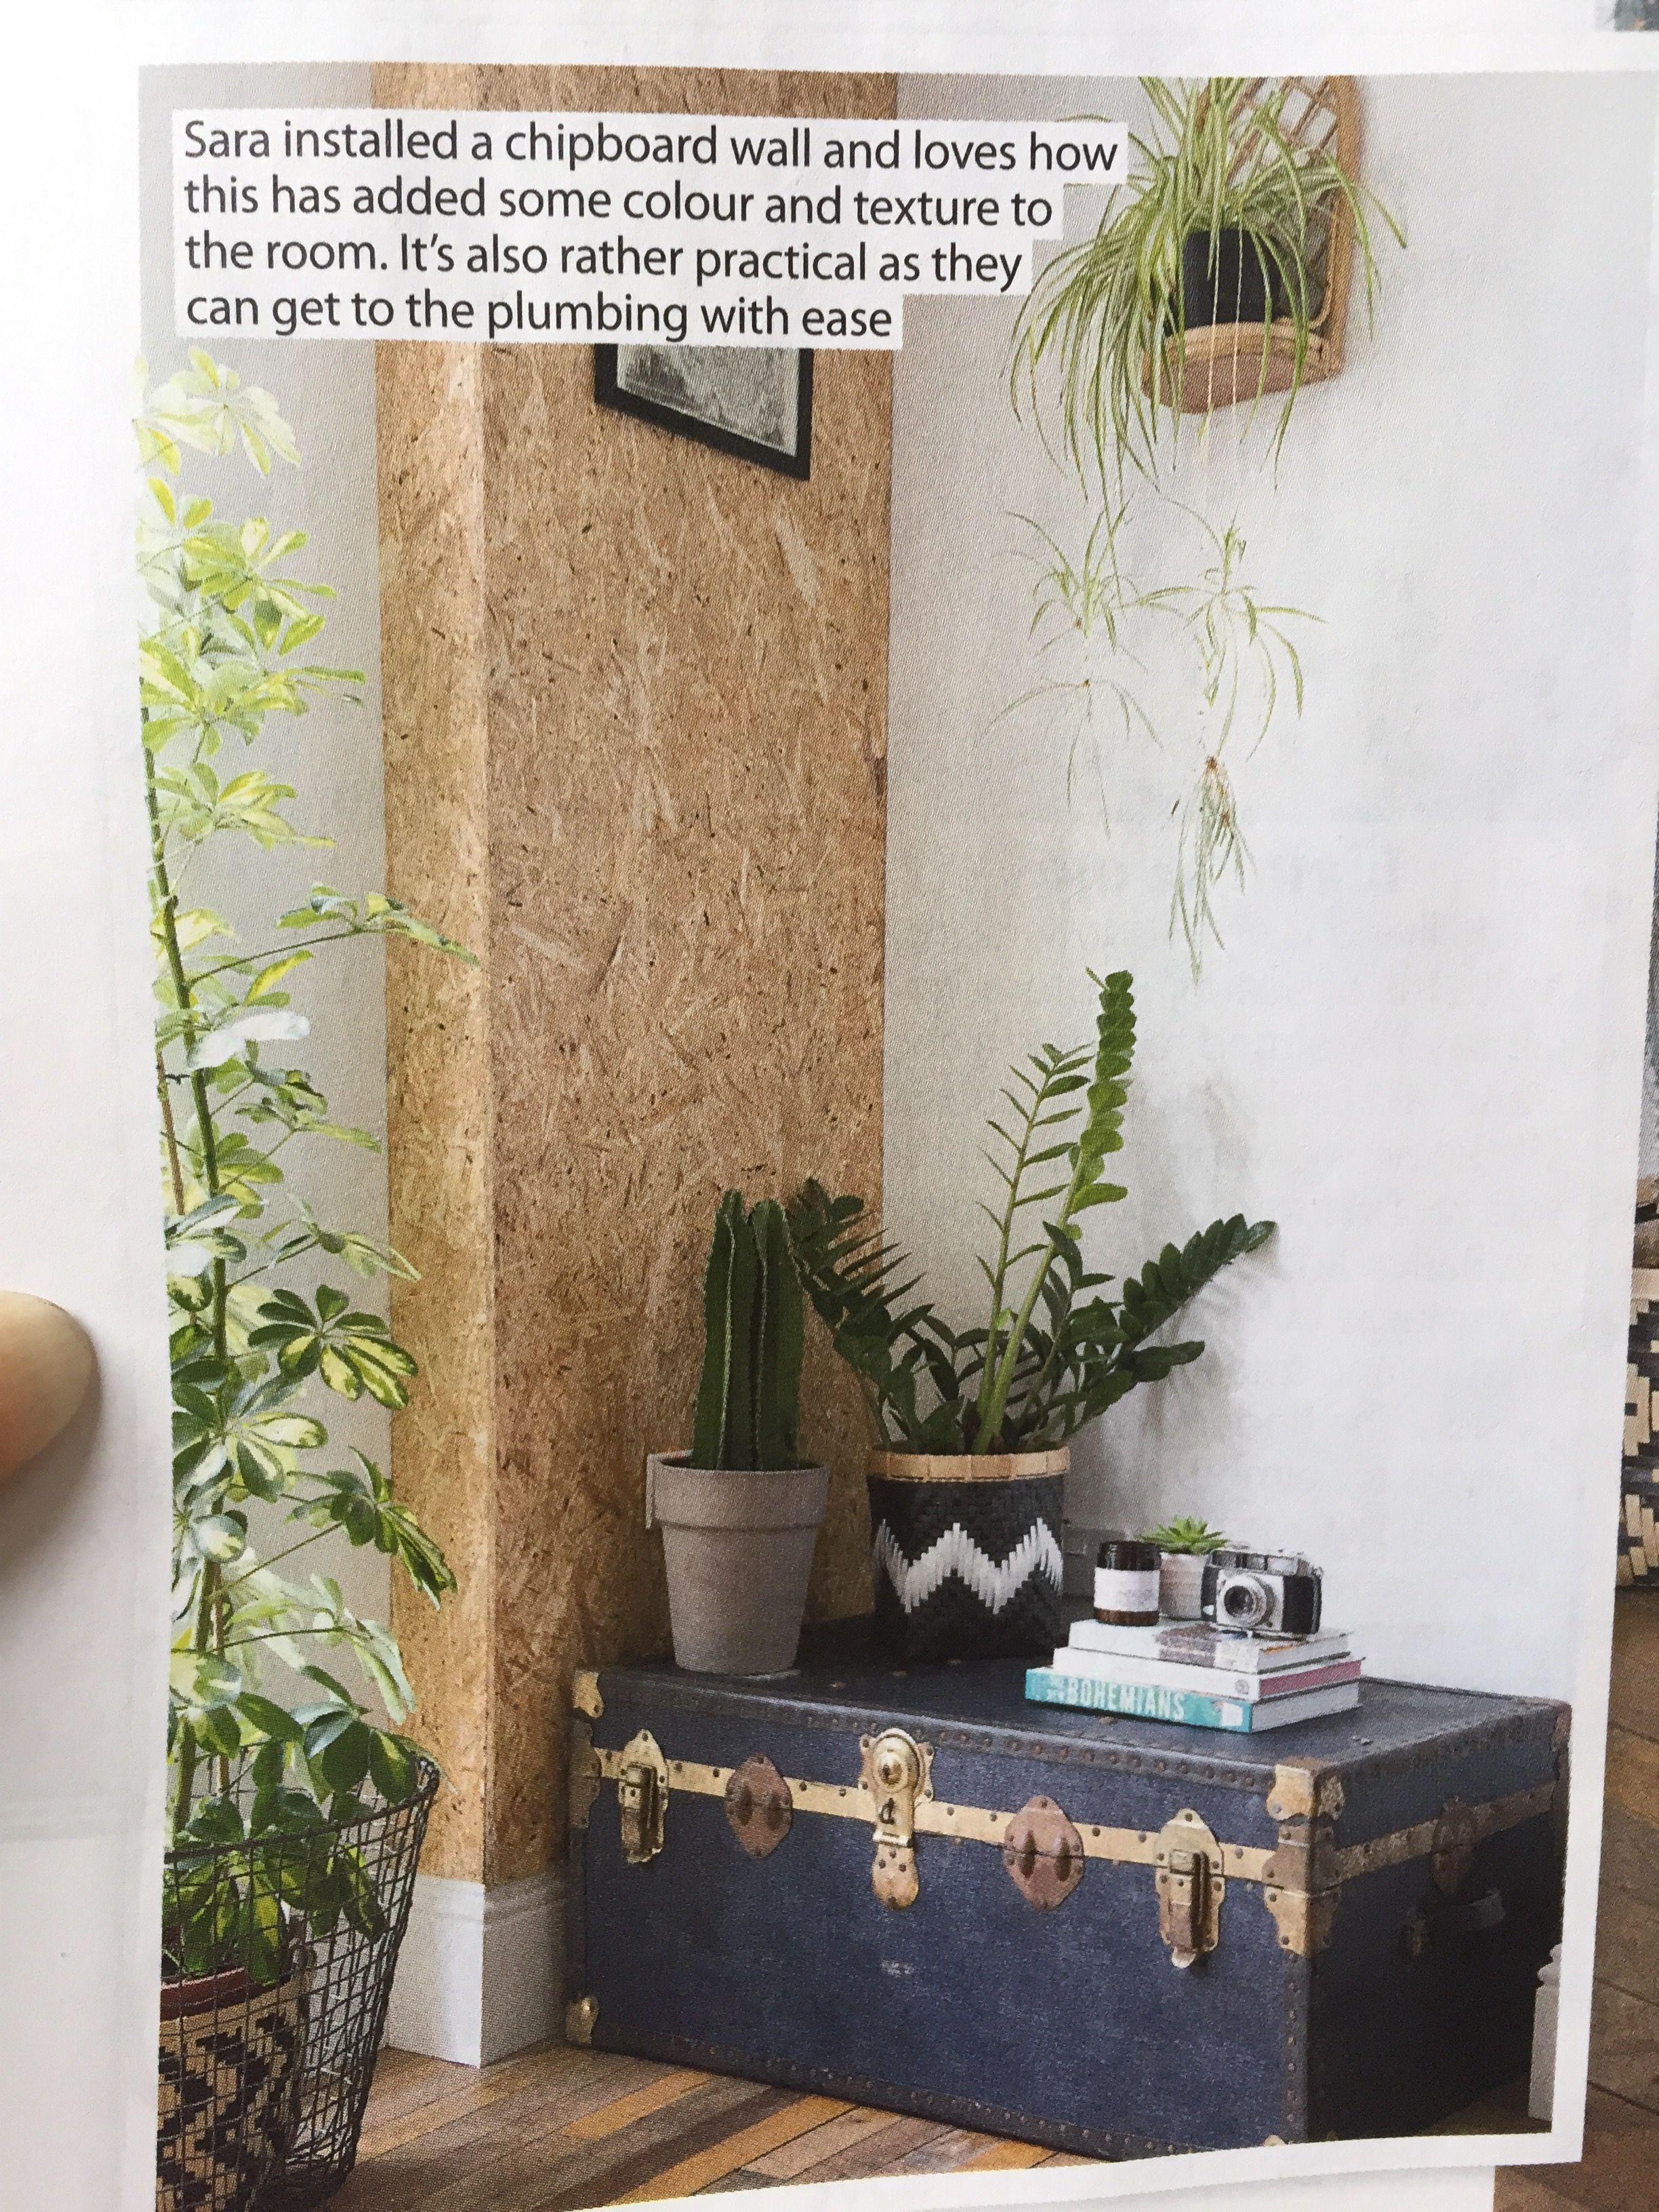 Salon-spiegel-designs pin by sarah sharma on lounge  pinterest